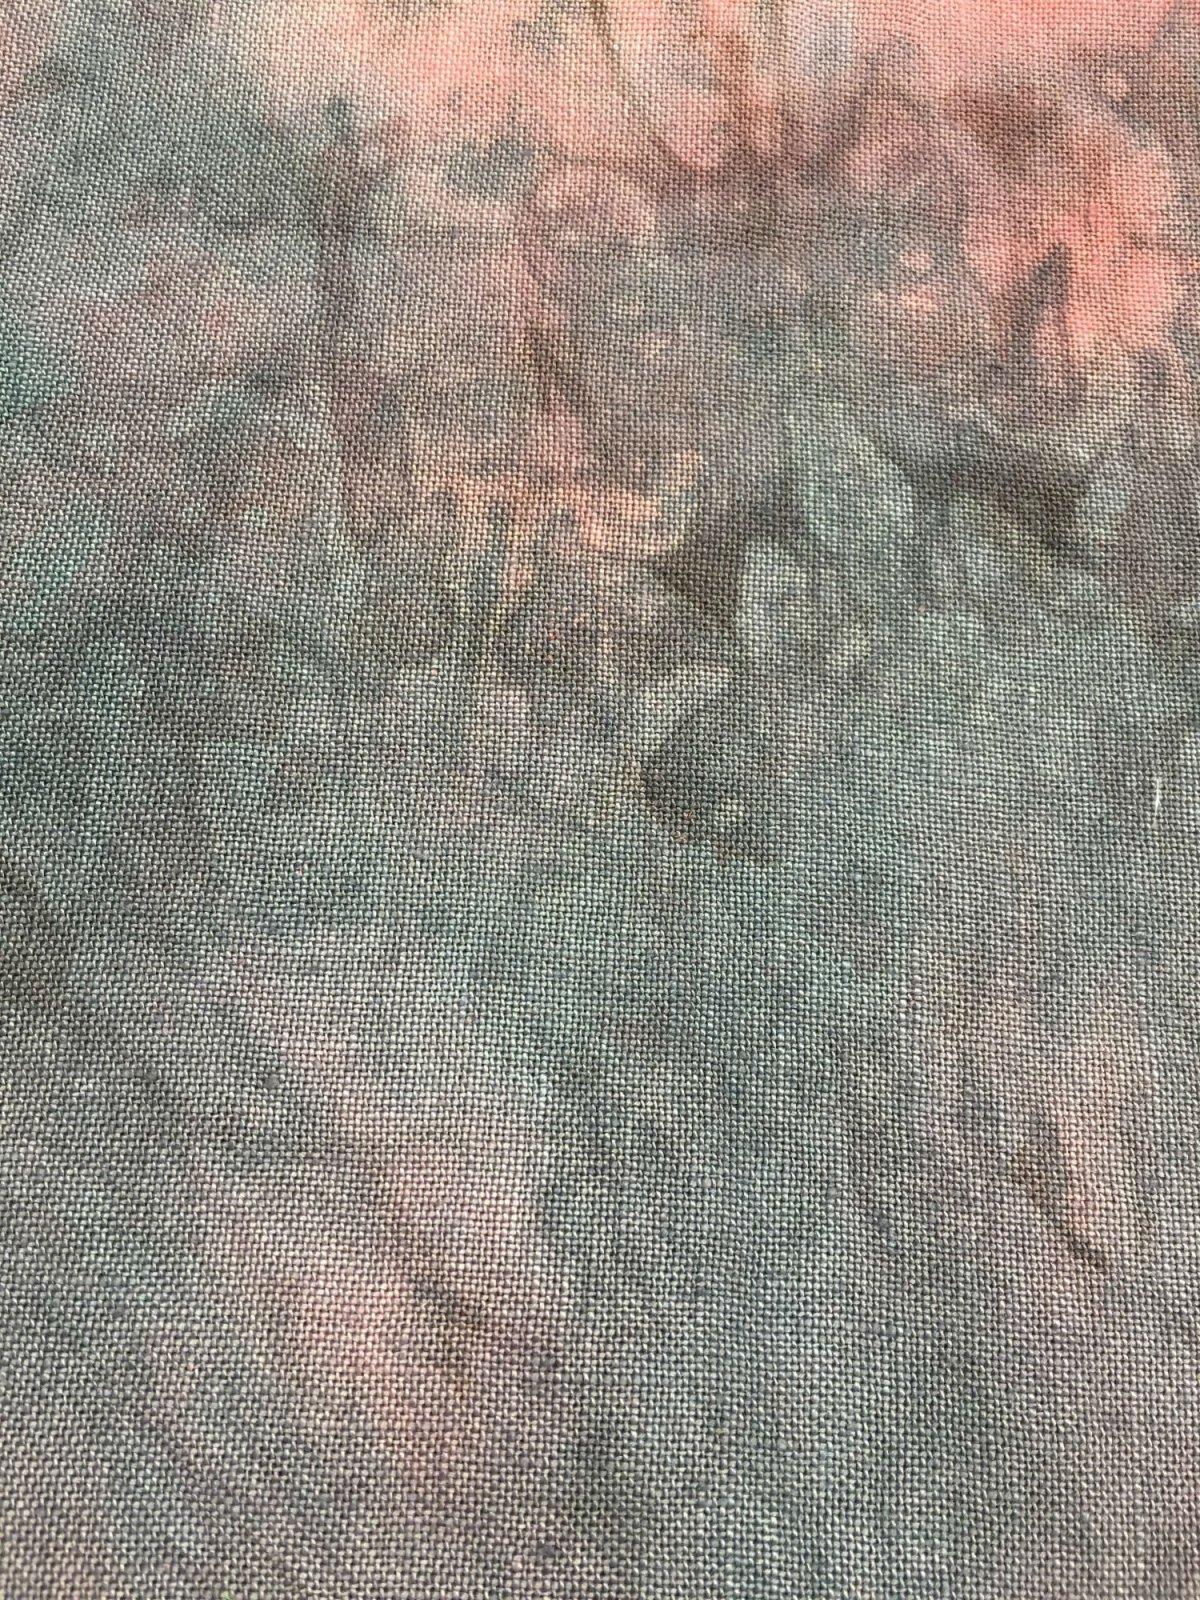 Enchanting Lair Ember cashel 18 x 27